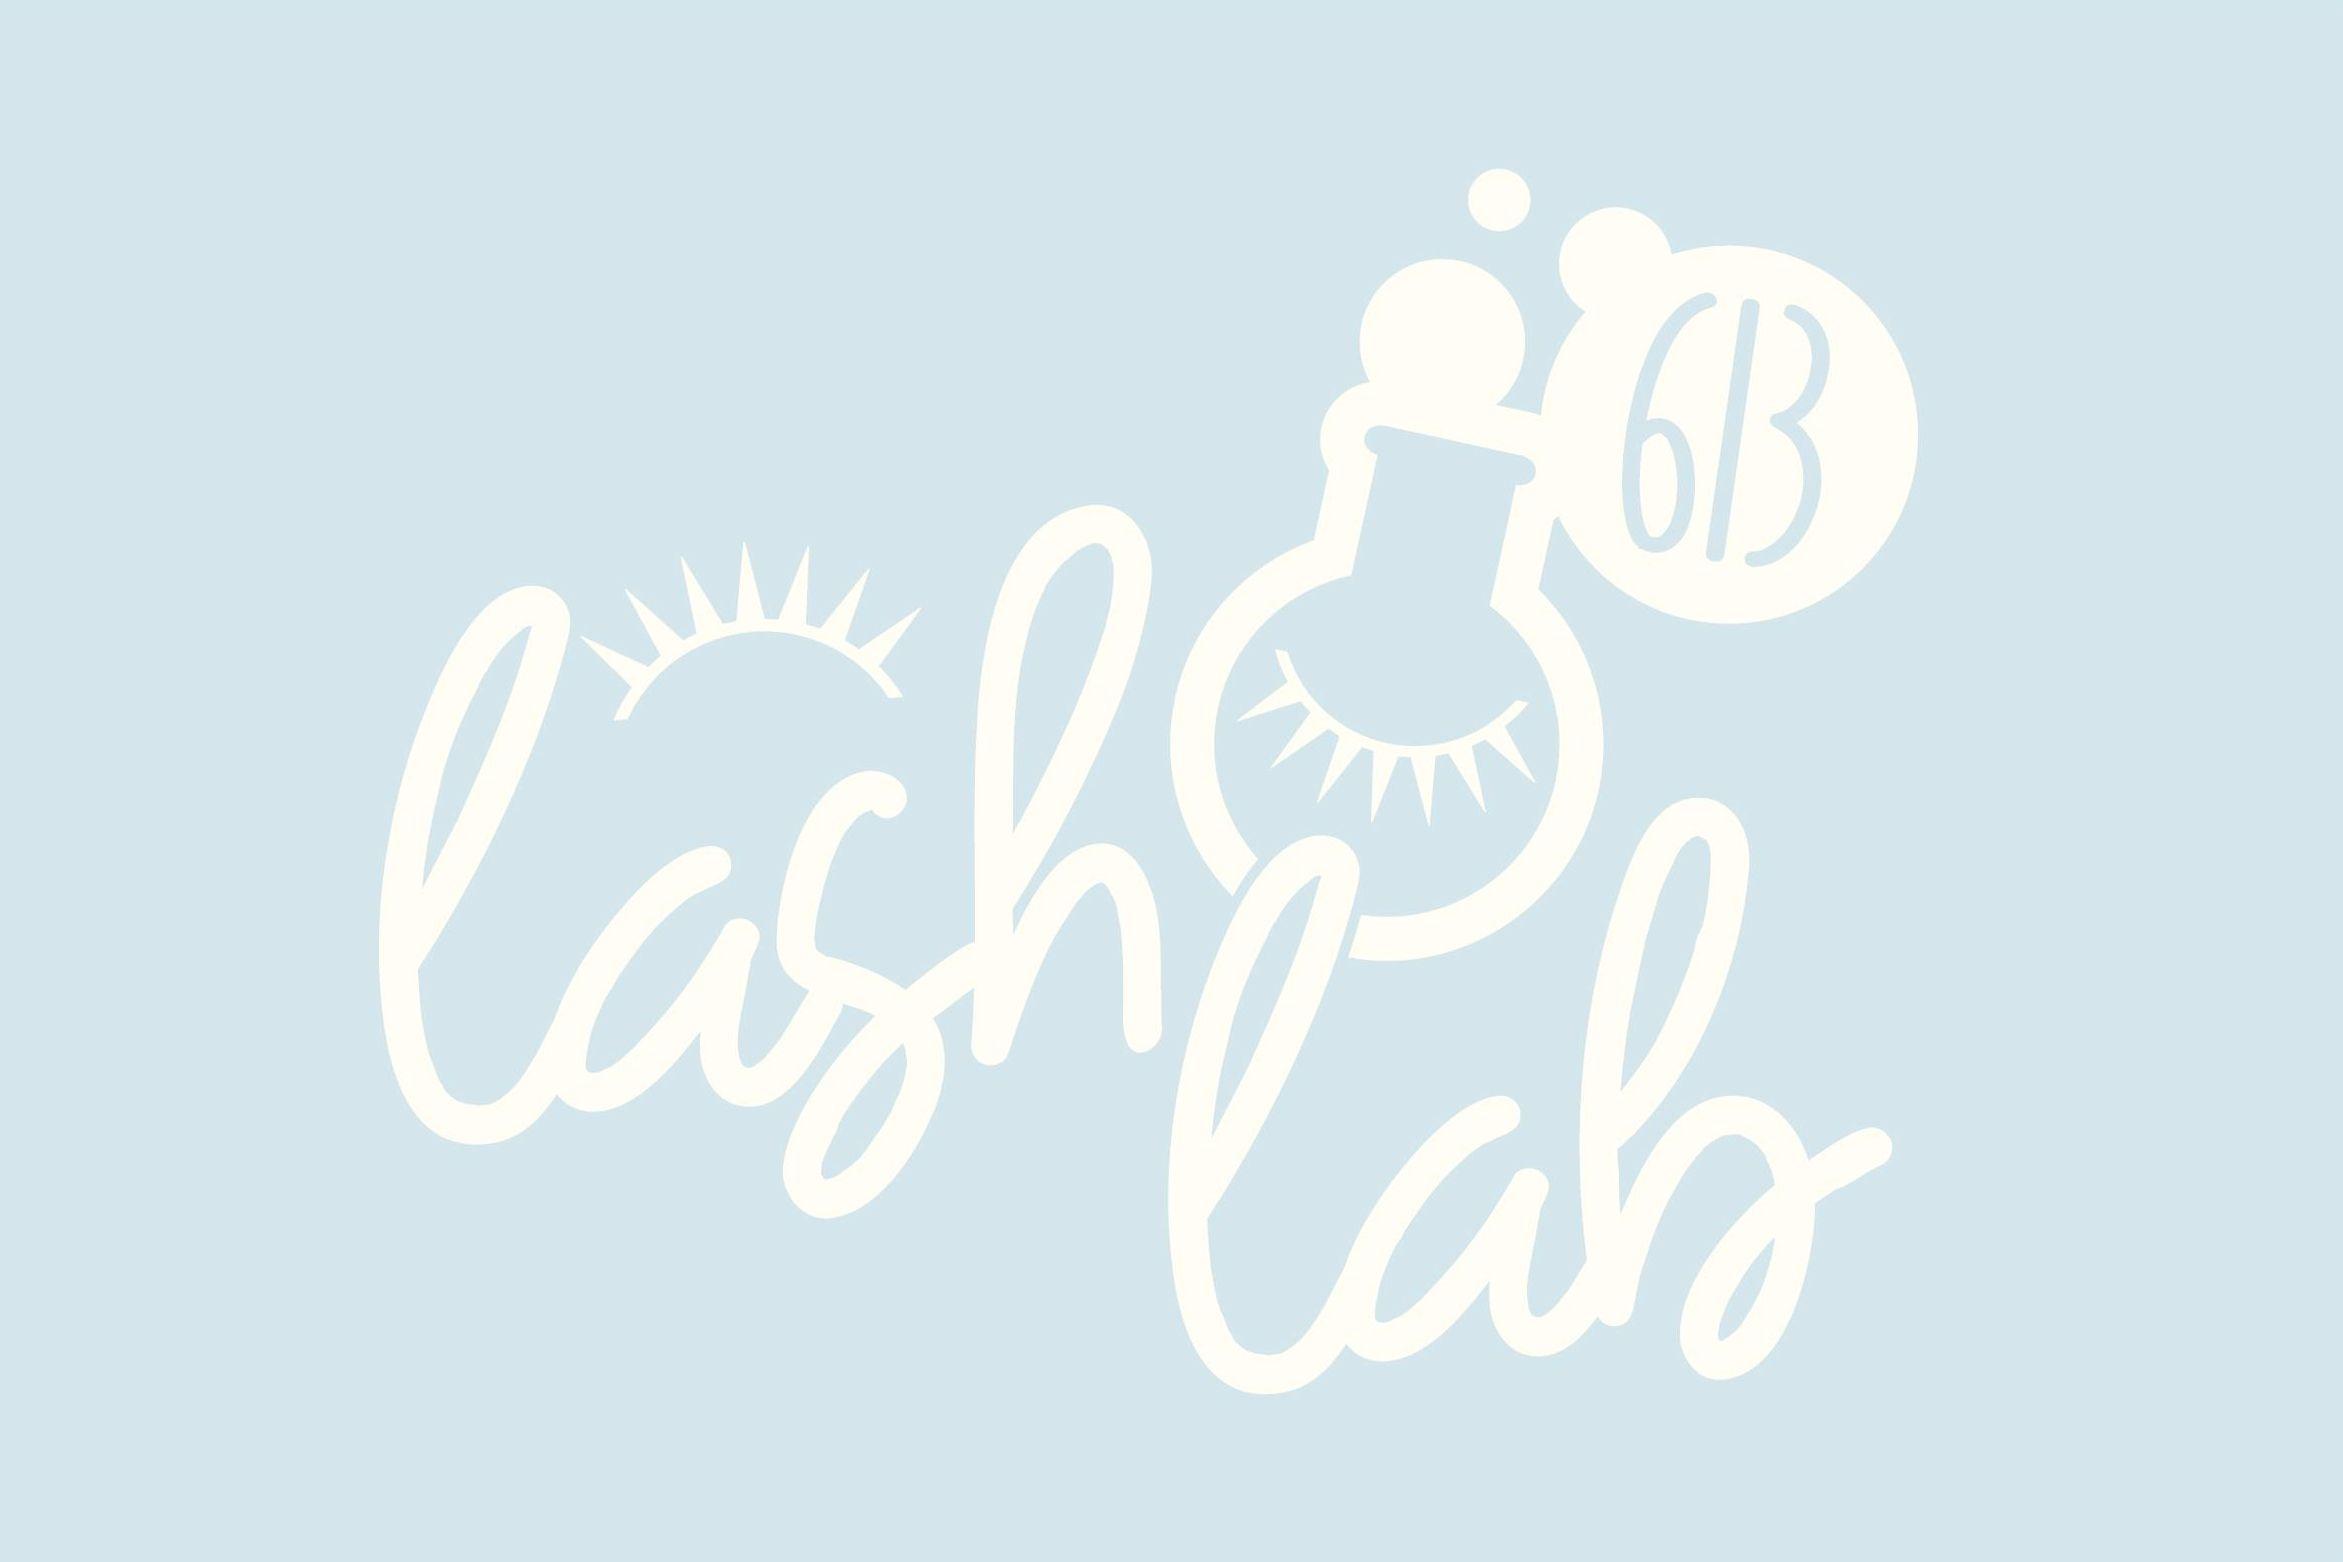 5fd52b80b93 Lash Lab 613 In Stittsville CA-ON | Vagaro | Salon, Spa & Fitness ...